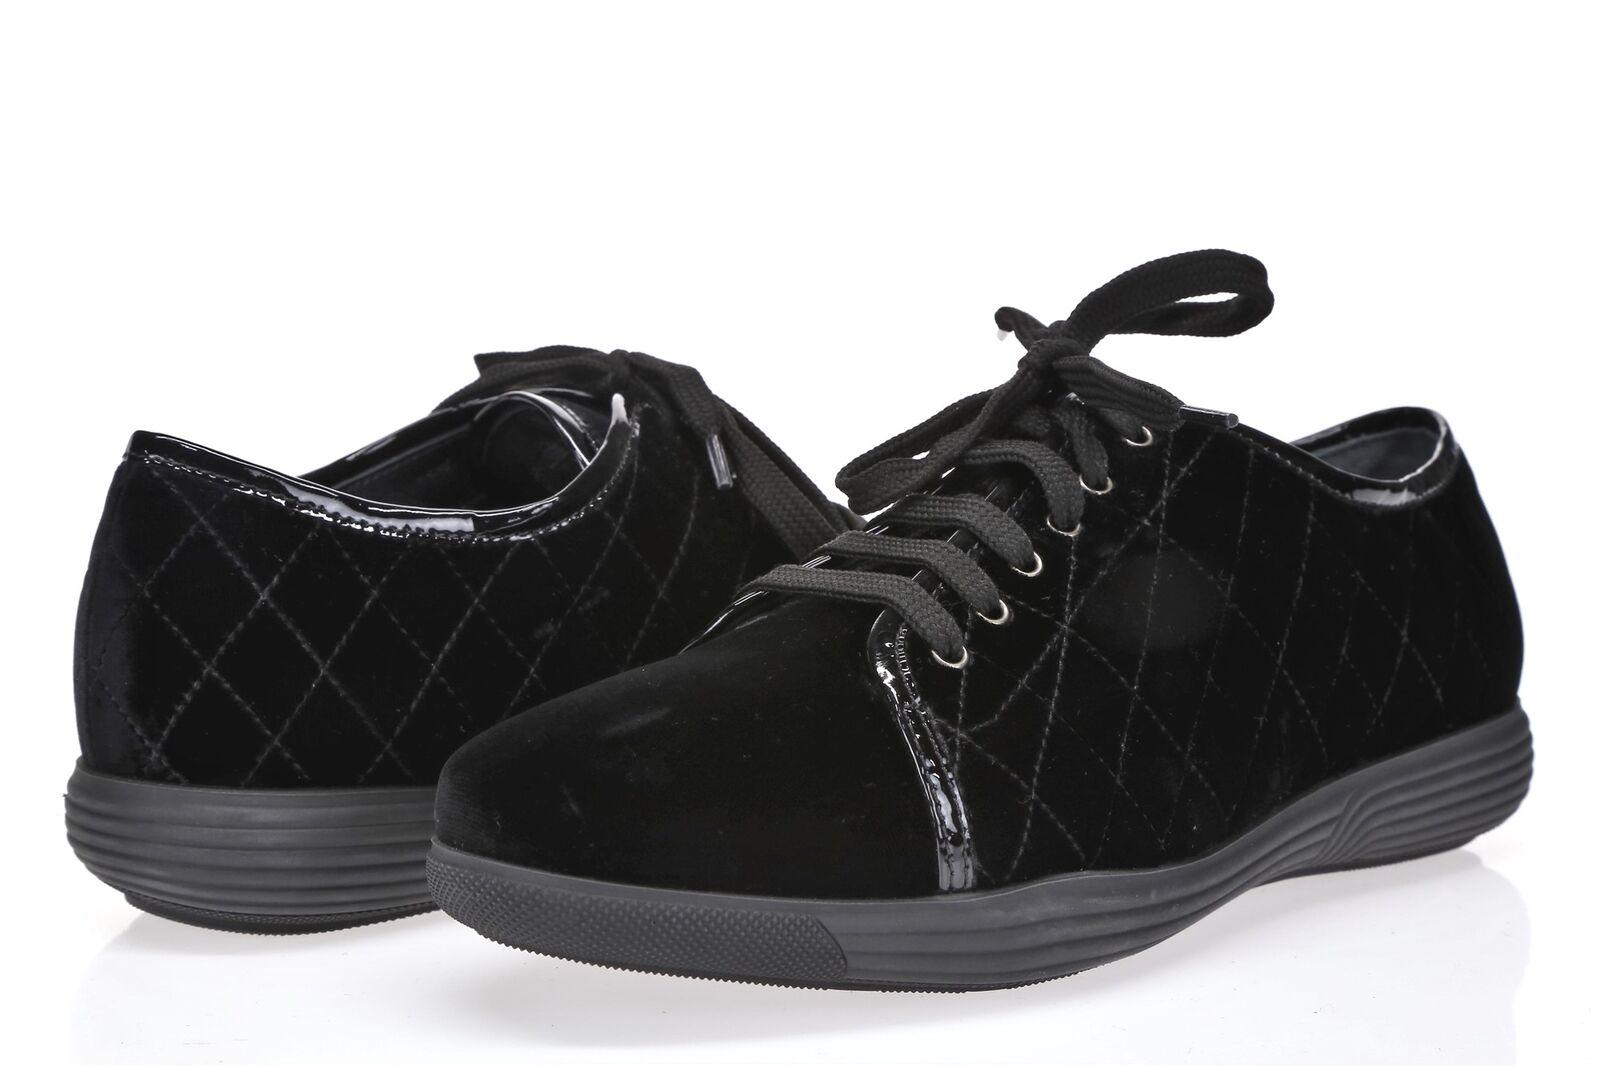 AQUATALIA Womens Black Velvet Lace Up Fashion Sneakers Sz 8.5